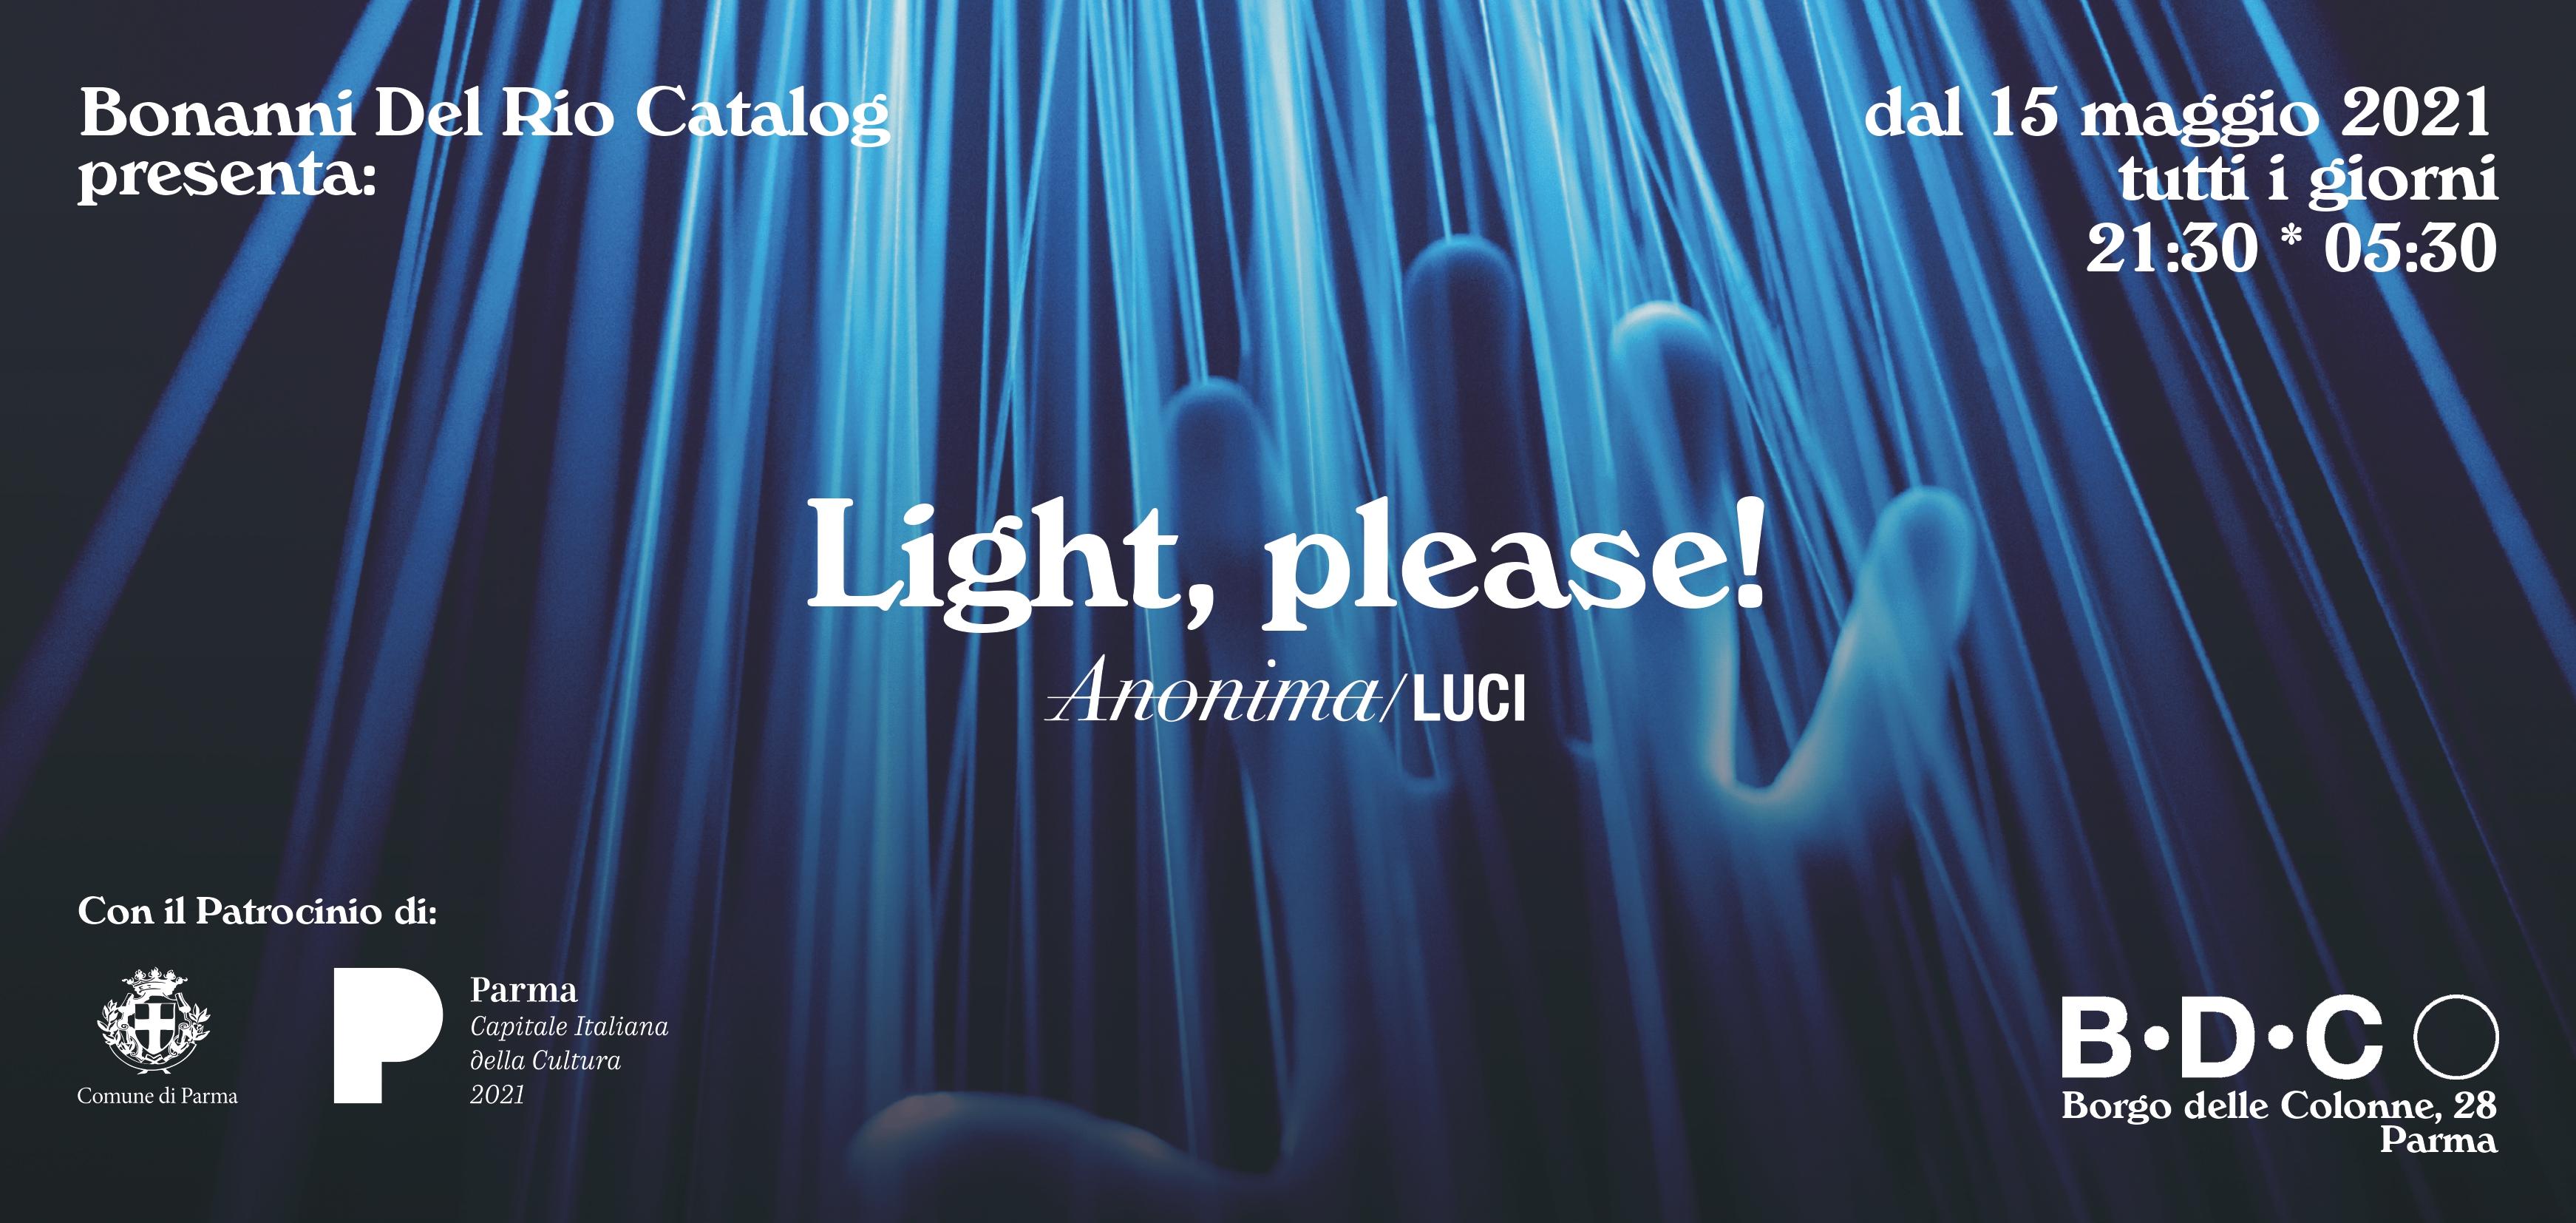 Light, please!